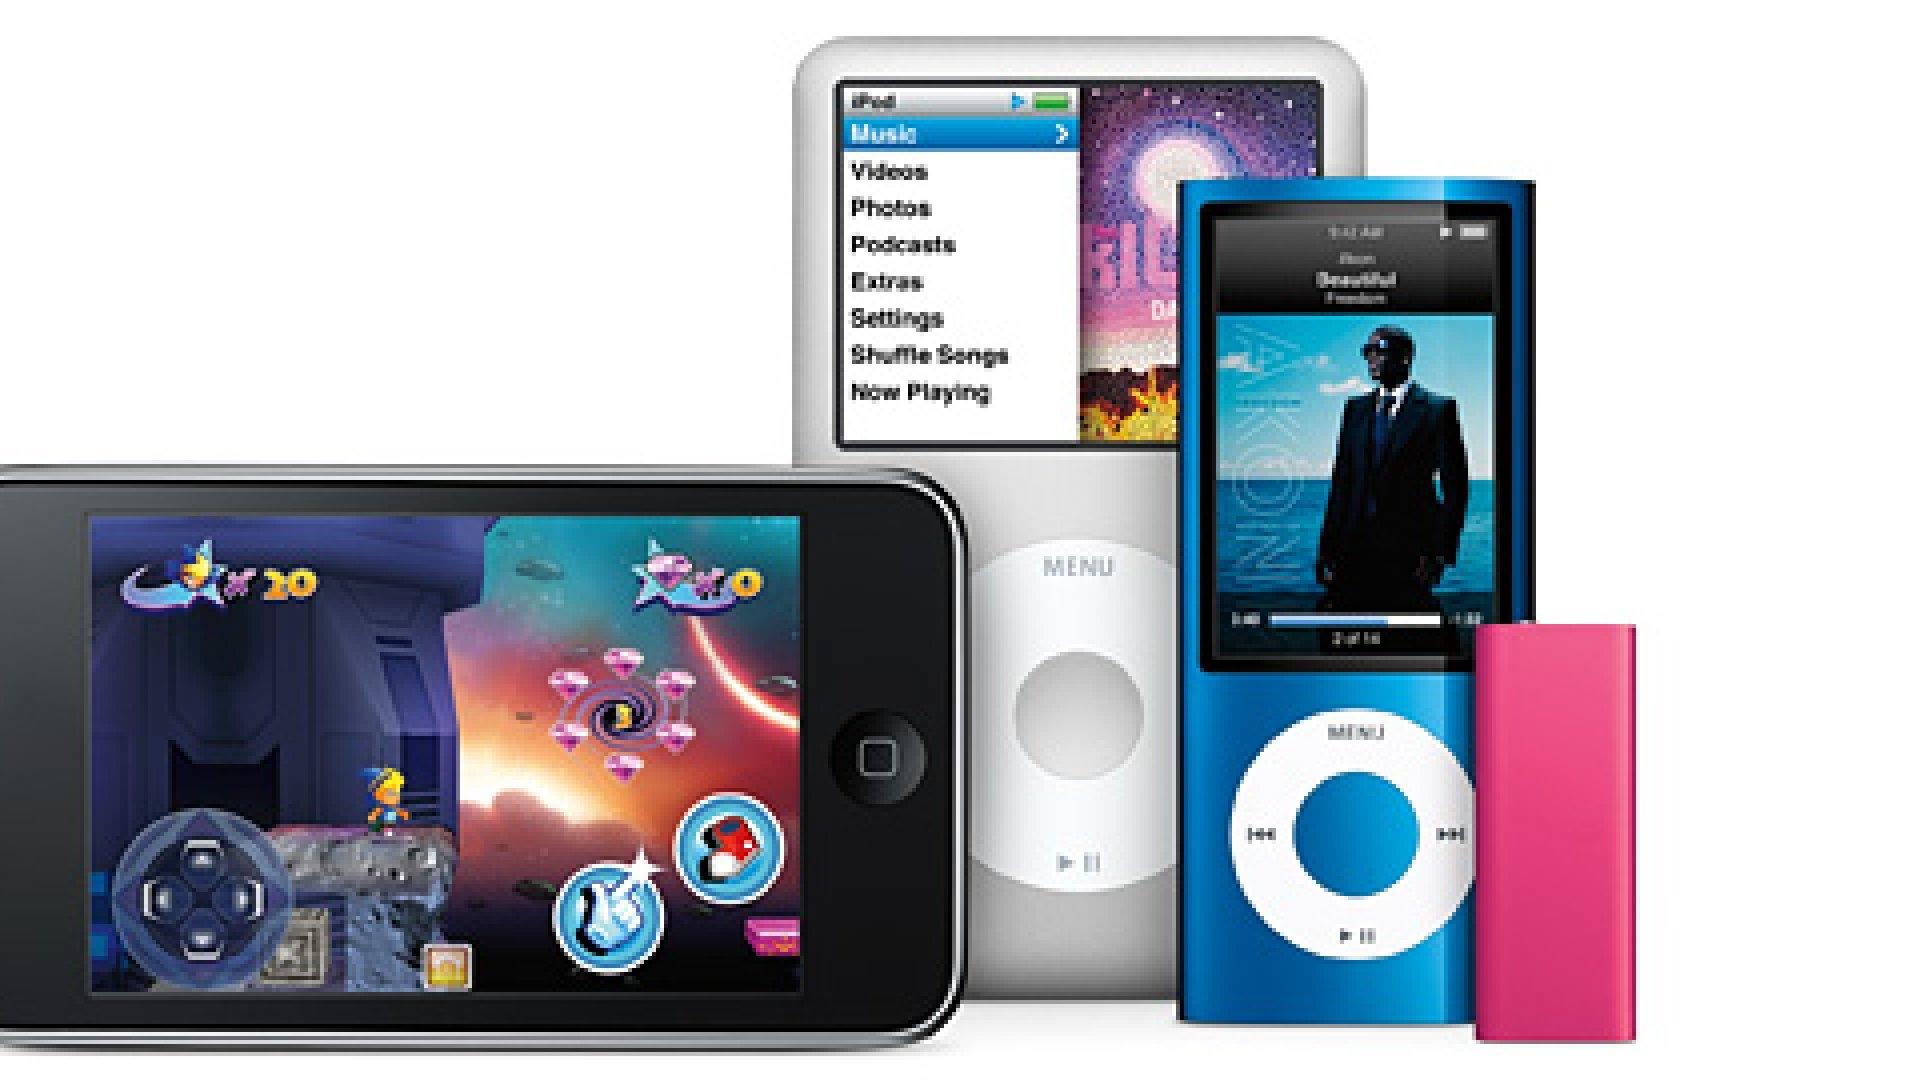 Start-Ups 2010: Publishing Children's Books for the iPhone